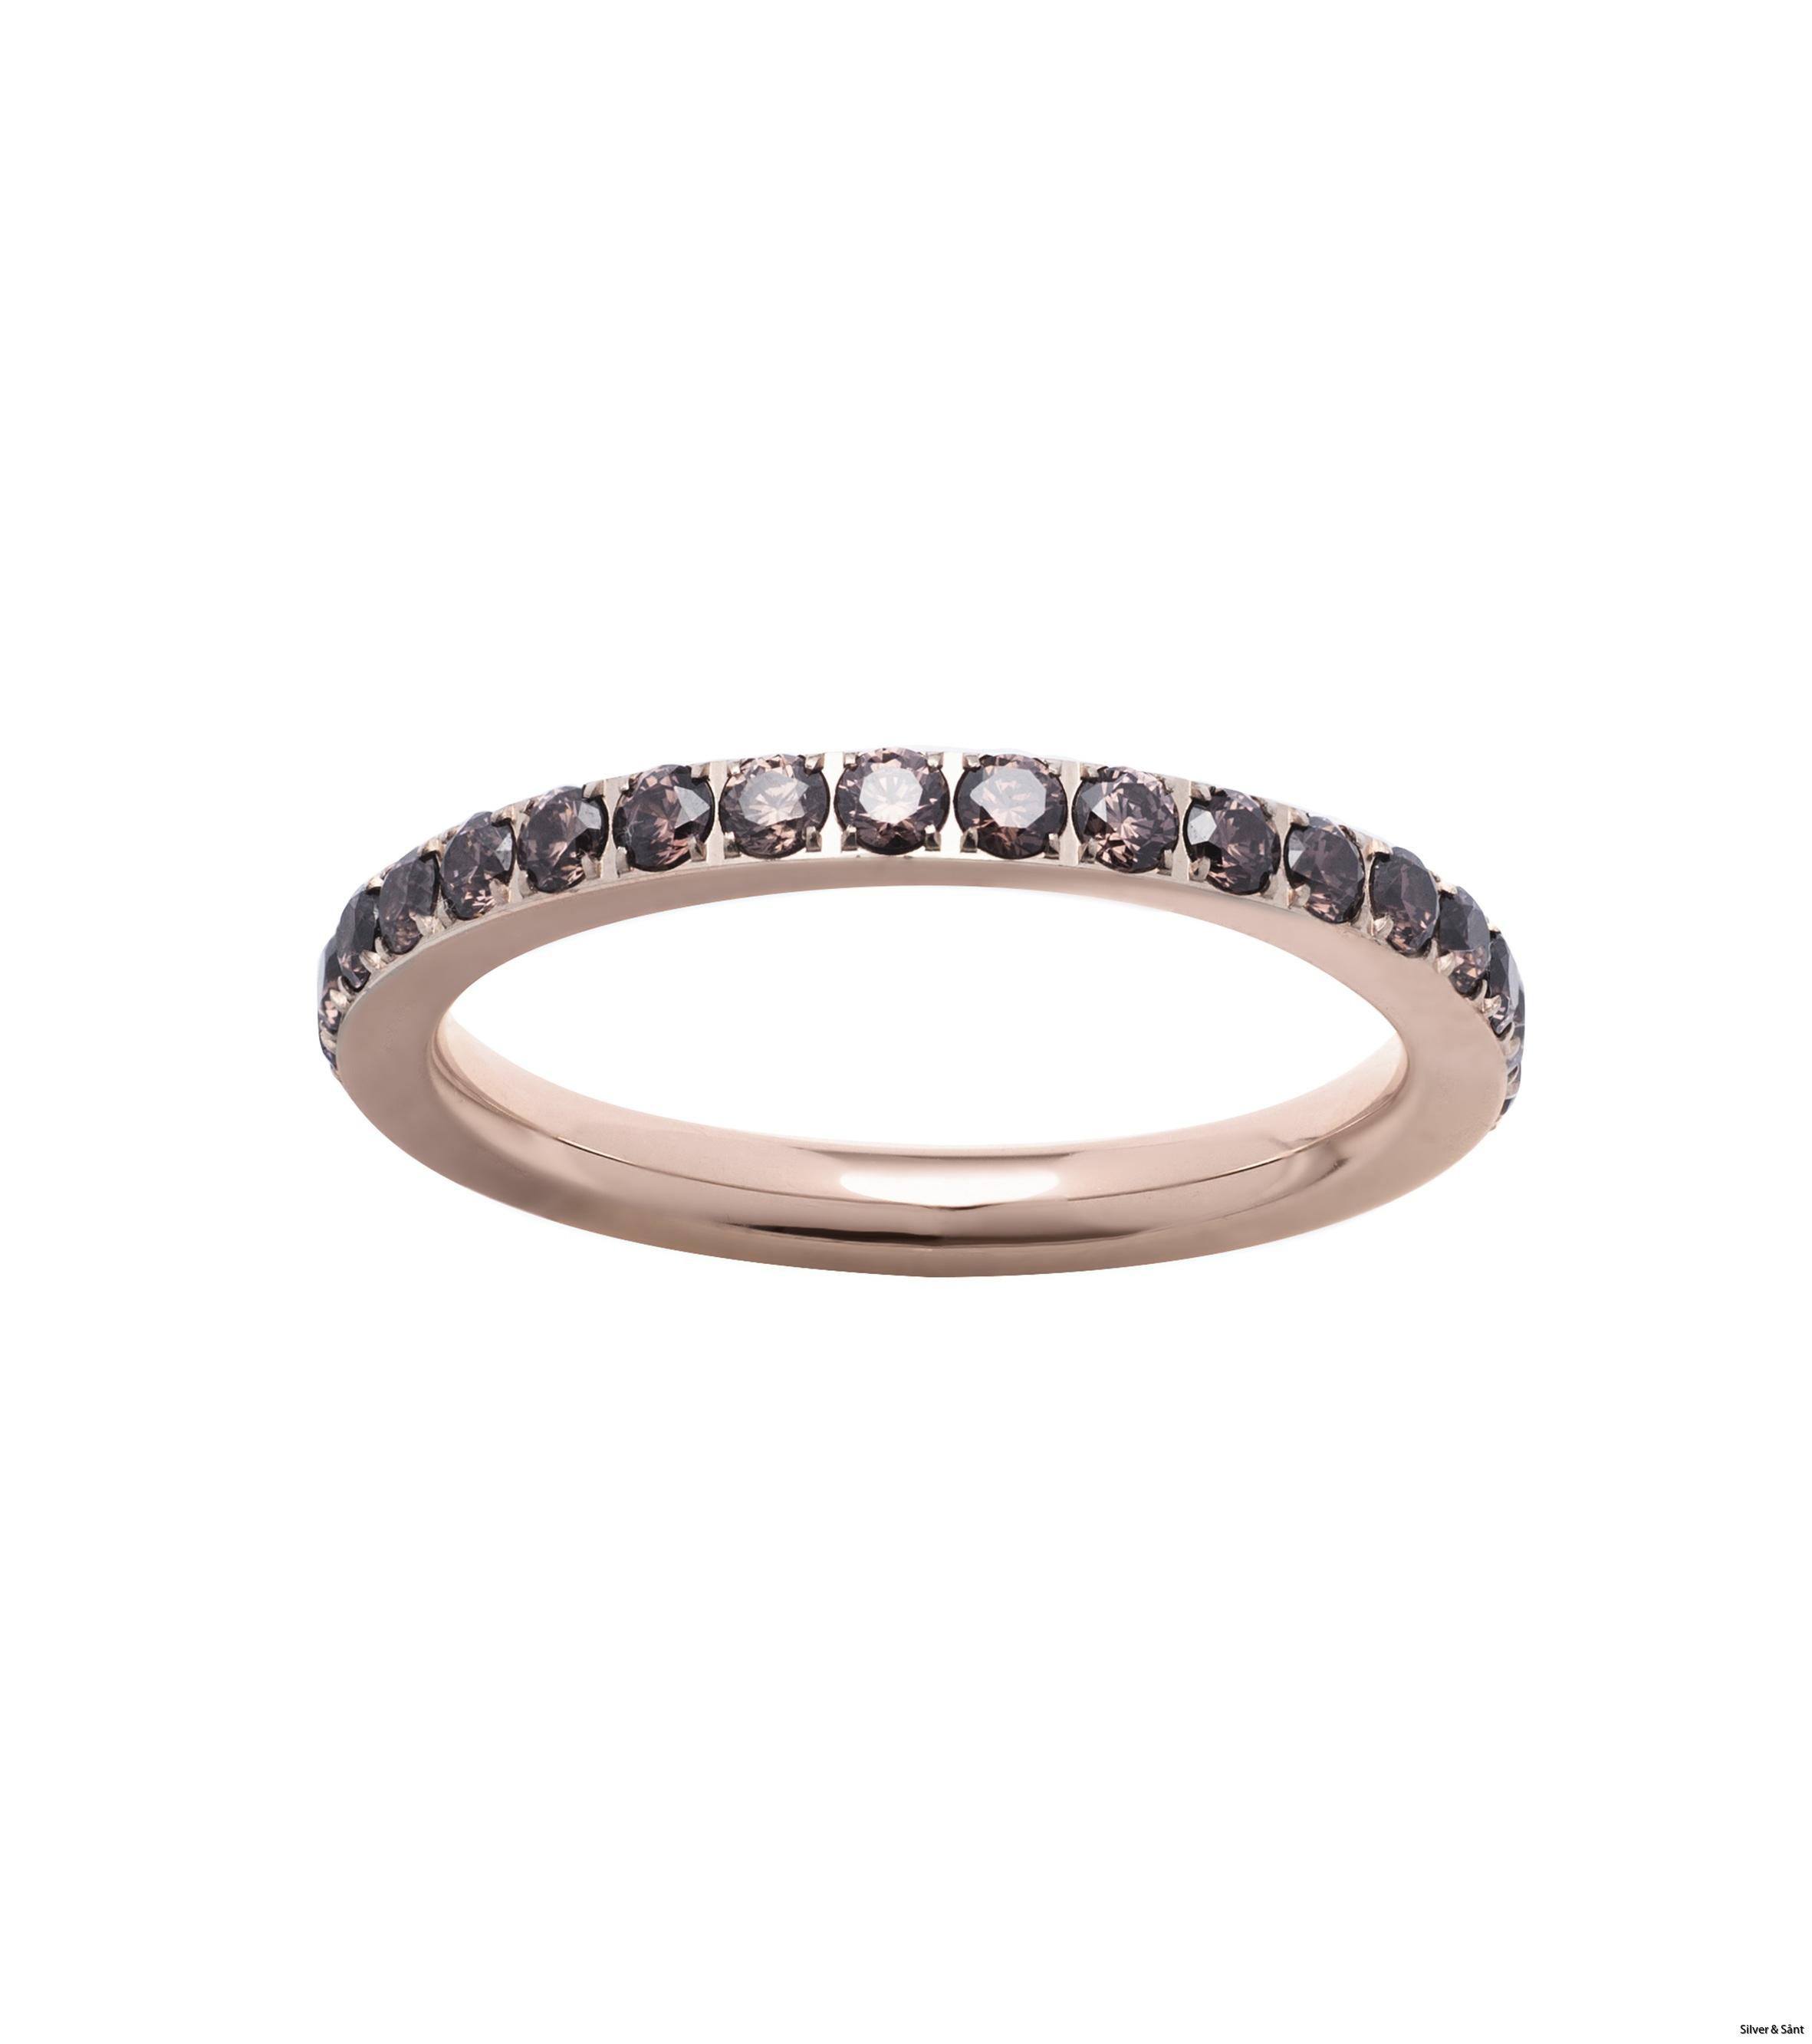 Edblad-Glow-Ring-Espresso-PI